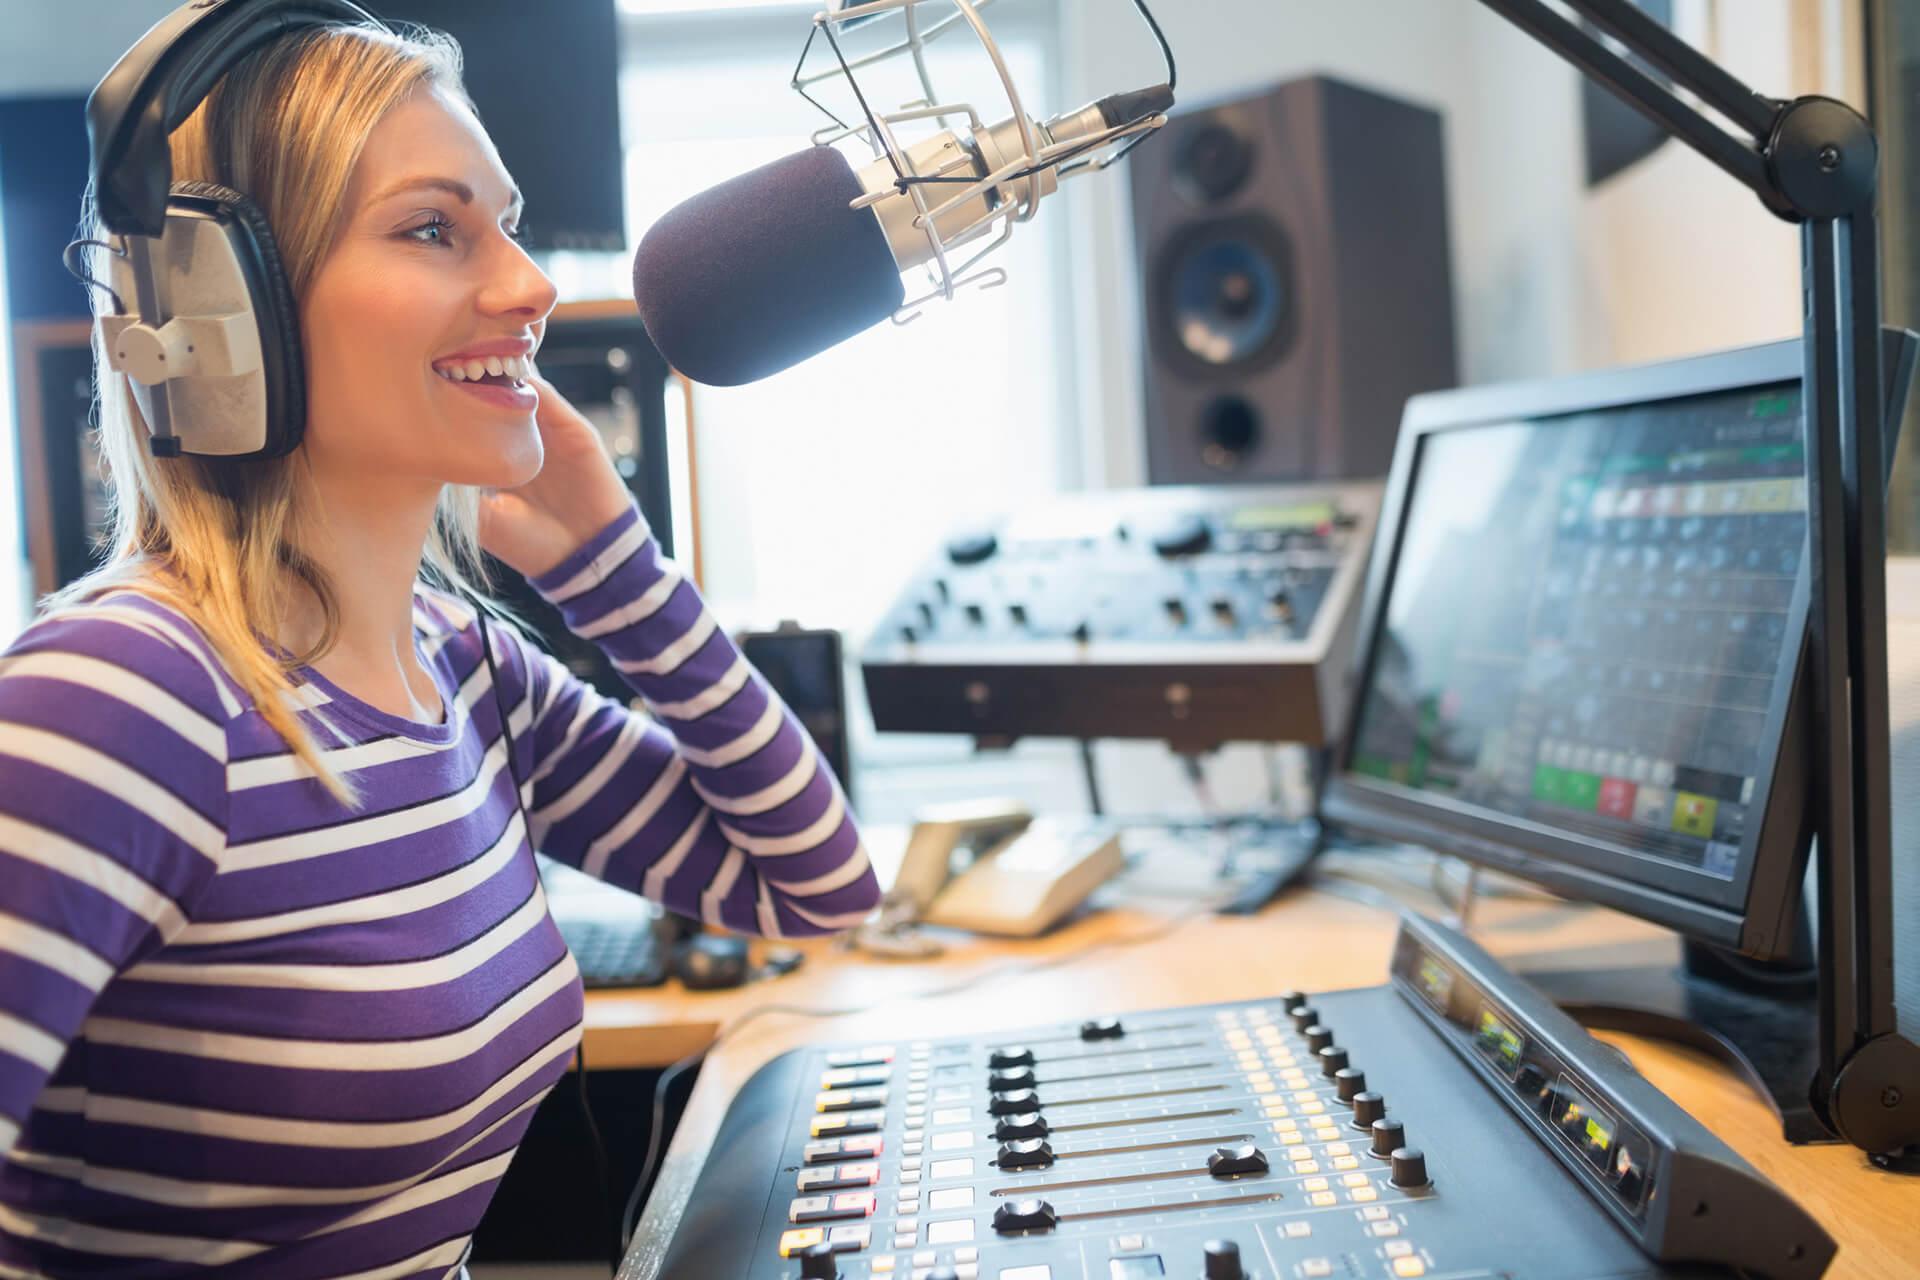 Frau vor Mikrofon in Radio Studio